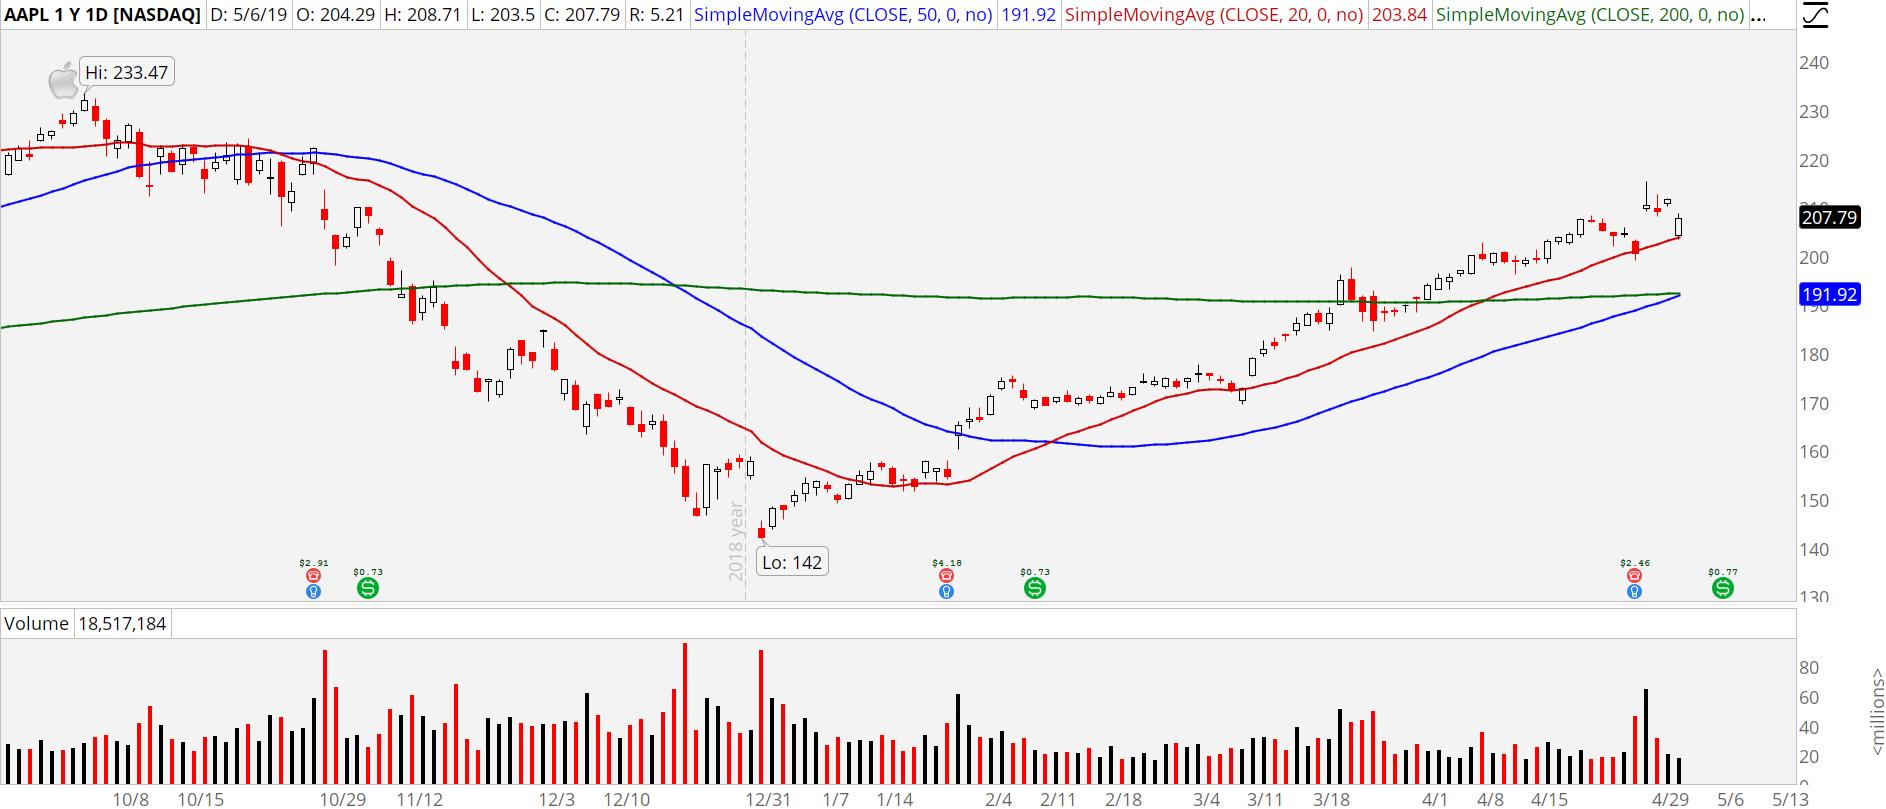 3 Stocks to Buy Despite the Turmoil | InvestorPlace